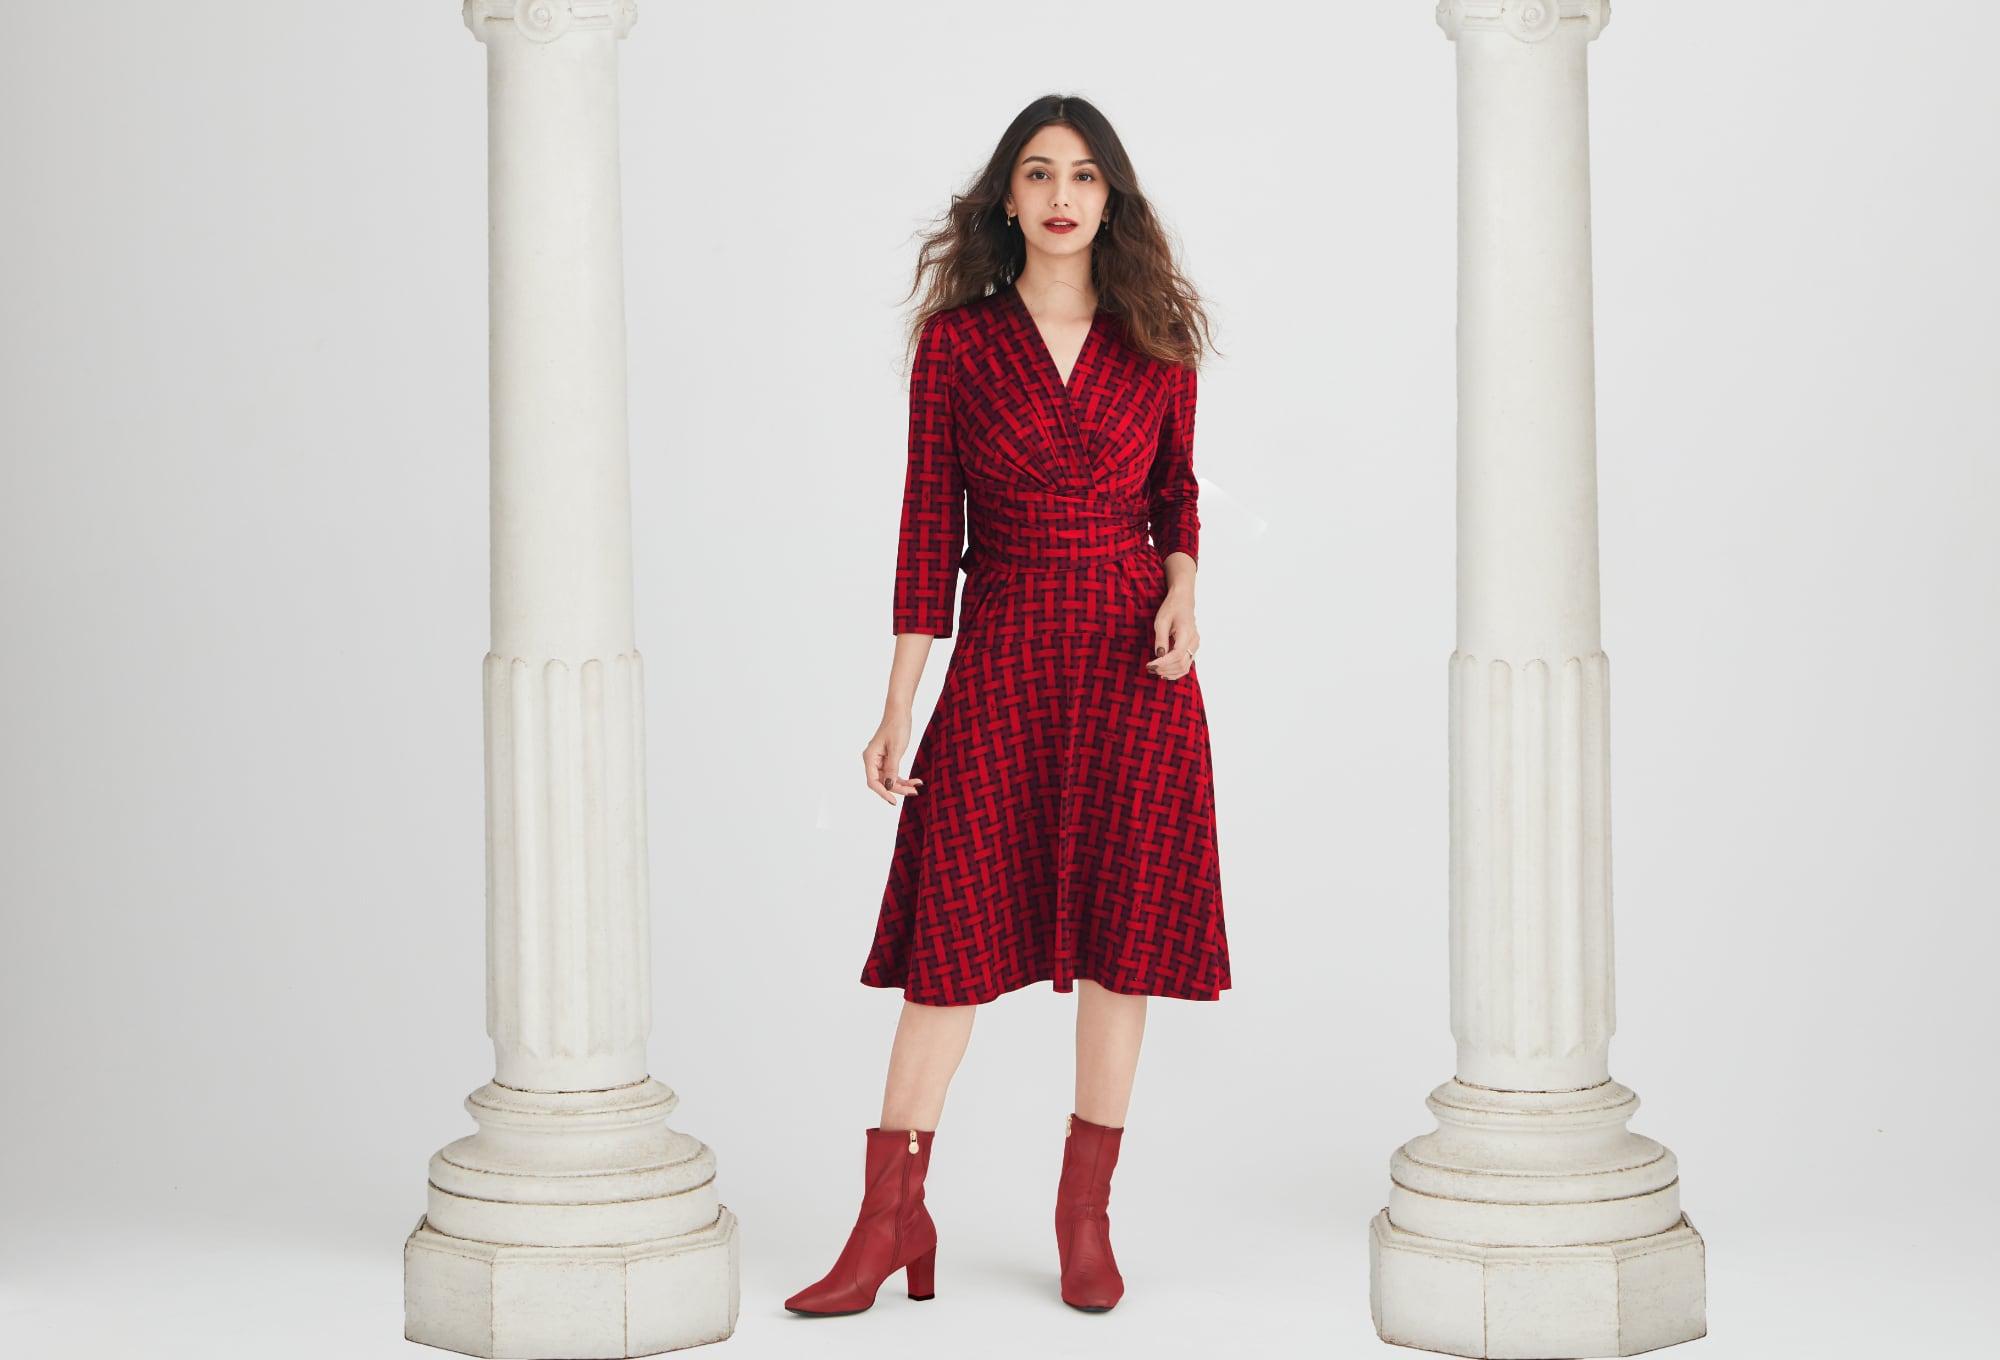 01_MV_Red_Check_CacheCoeur_Dress.jpg